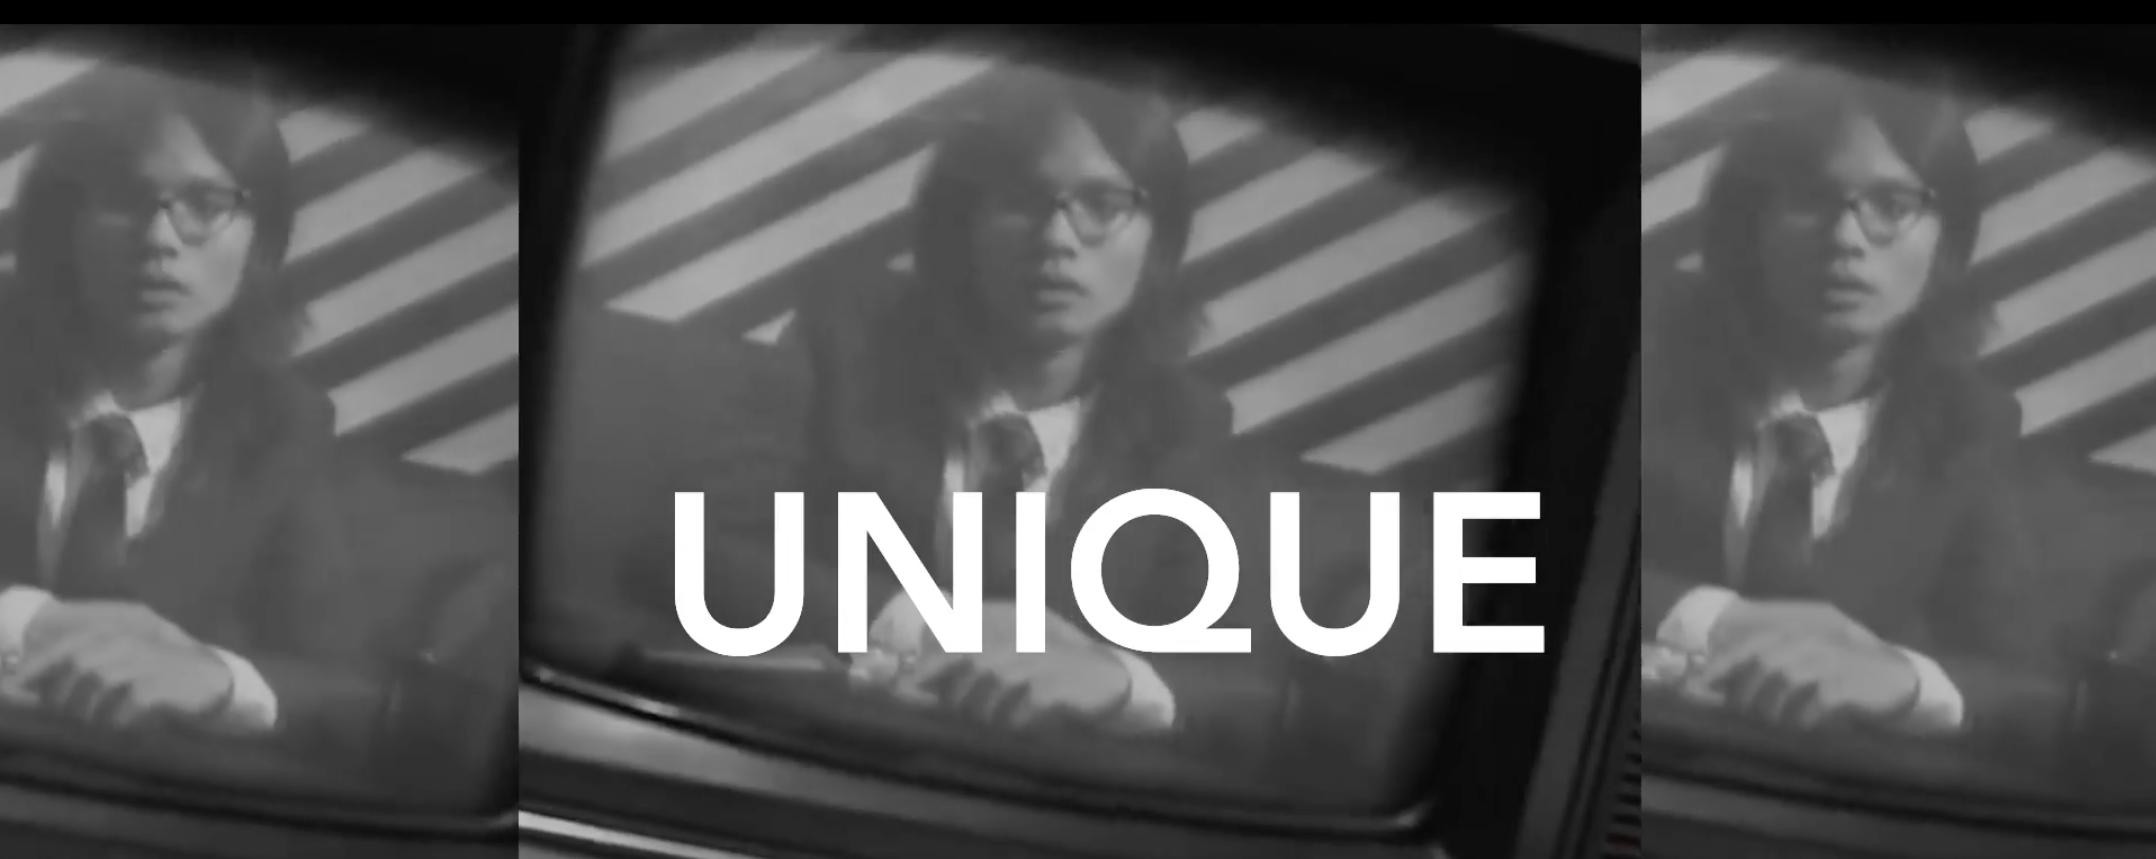 Unique: The Grandma Tour